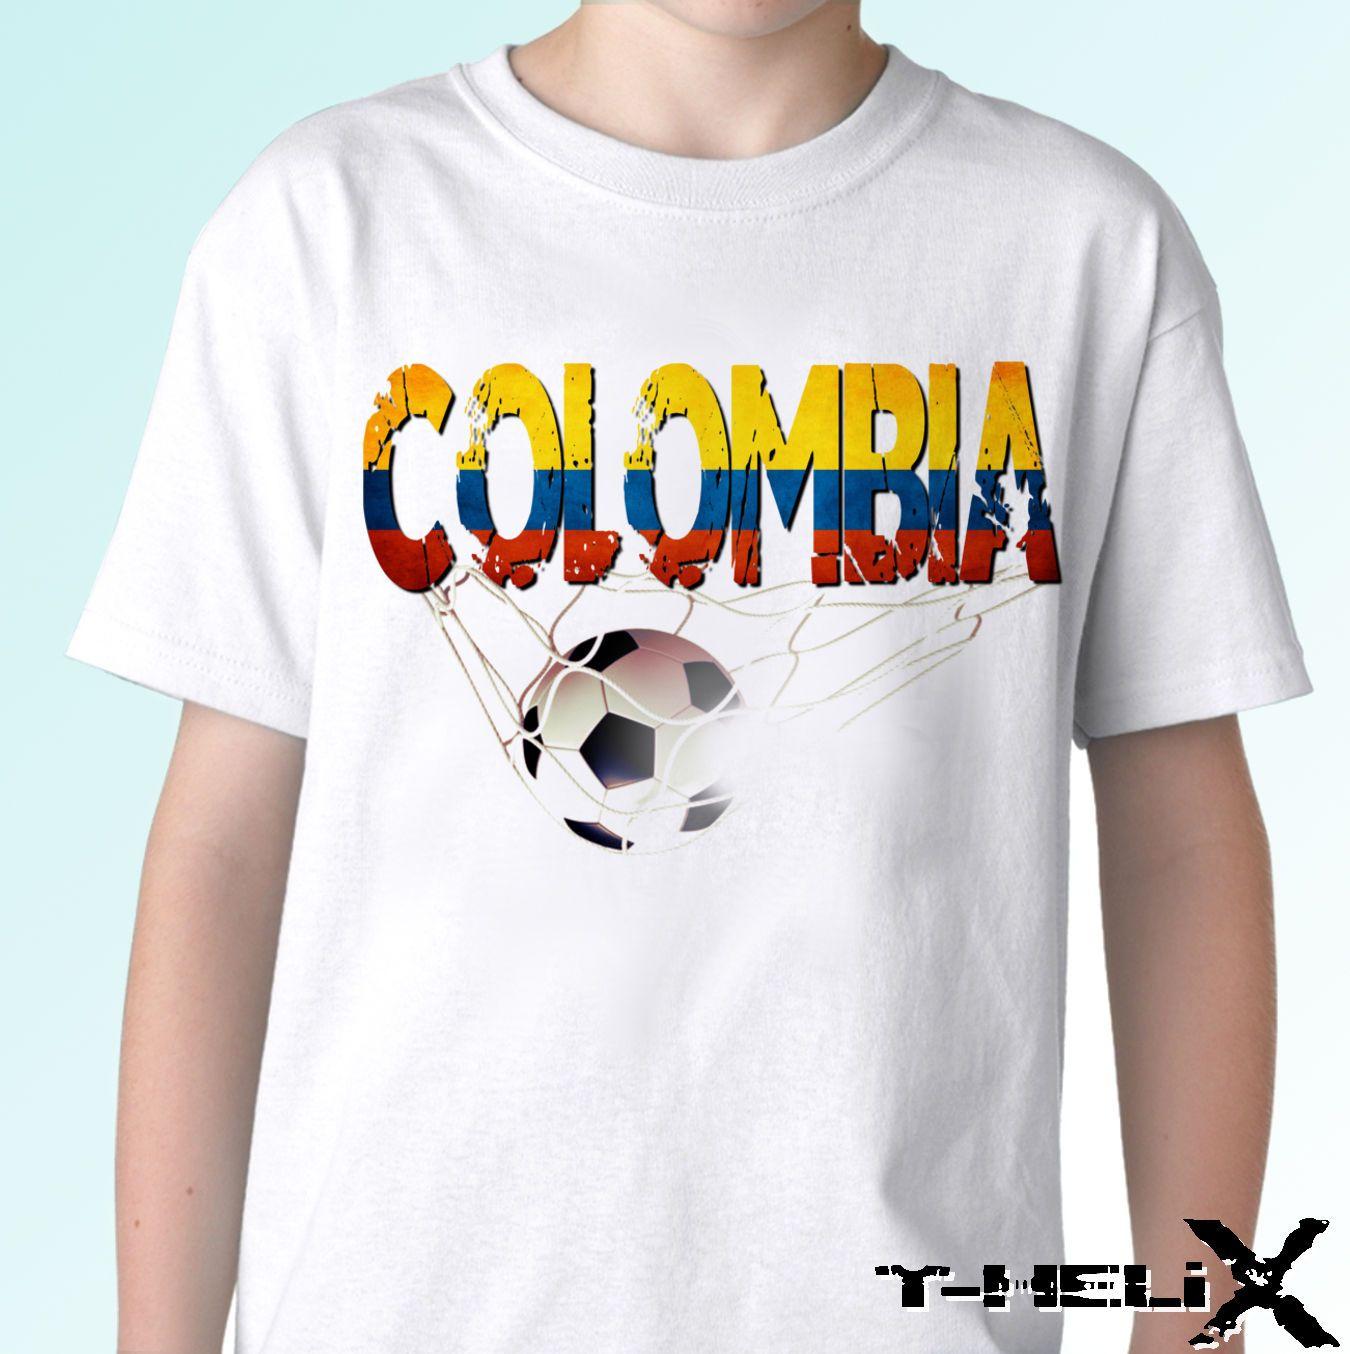 b7b1b4e6a68 Colombia Football Flag White T Shirt Top Soccer Design Mens Womens Cool  Casual Pride T Shirt Men Unisex New Fashion Tshirt Mens Tee Shirts Rude T  Shirts ...